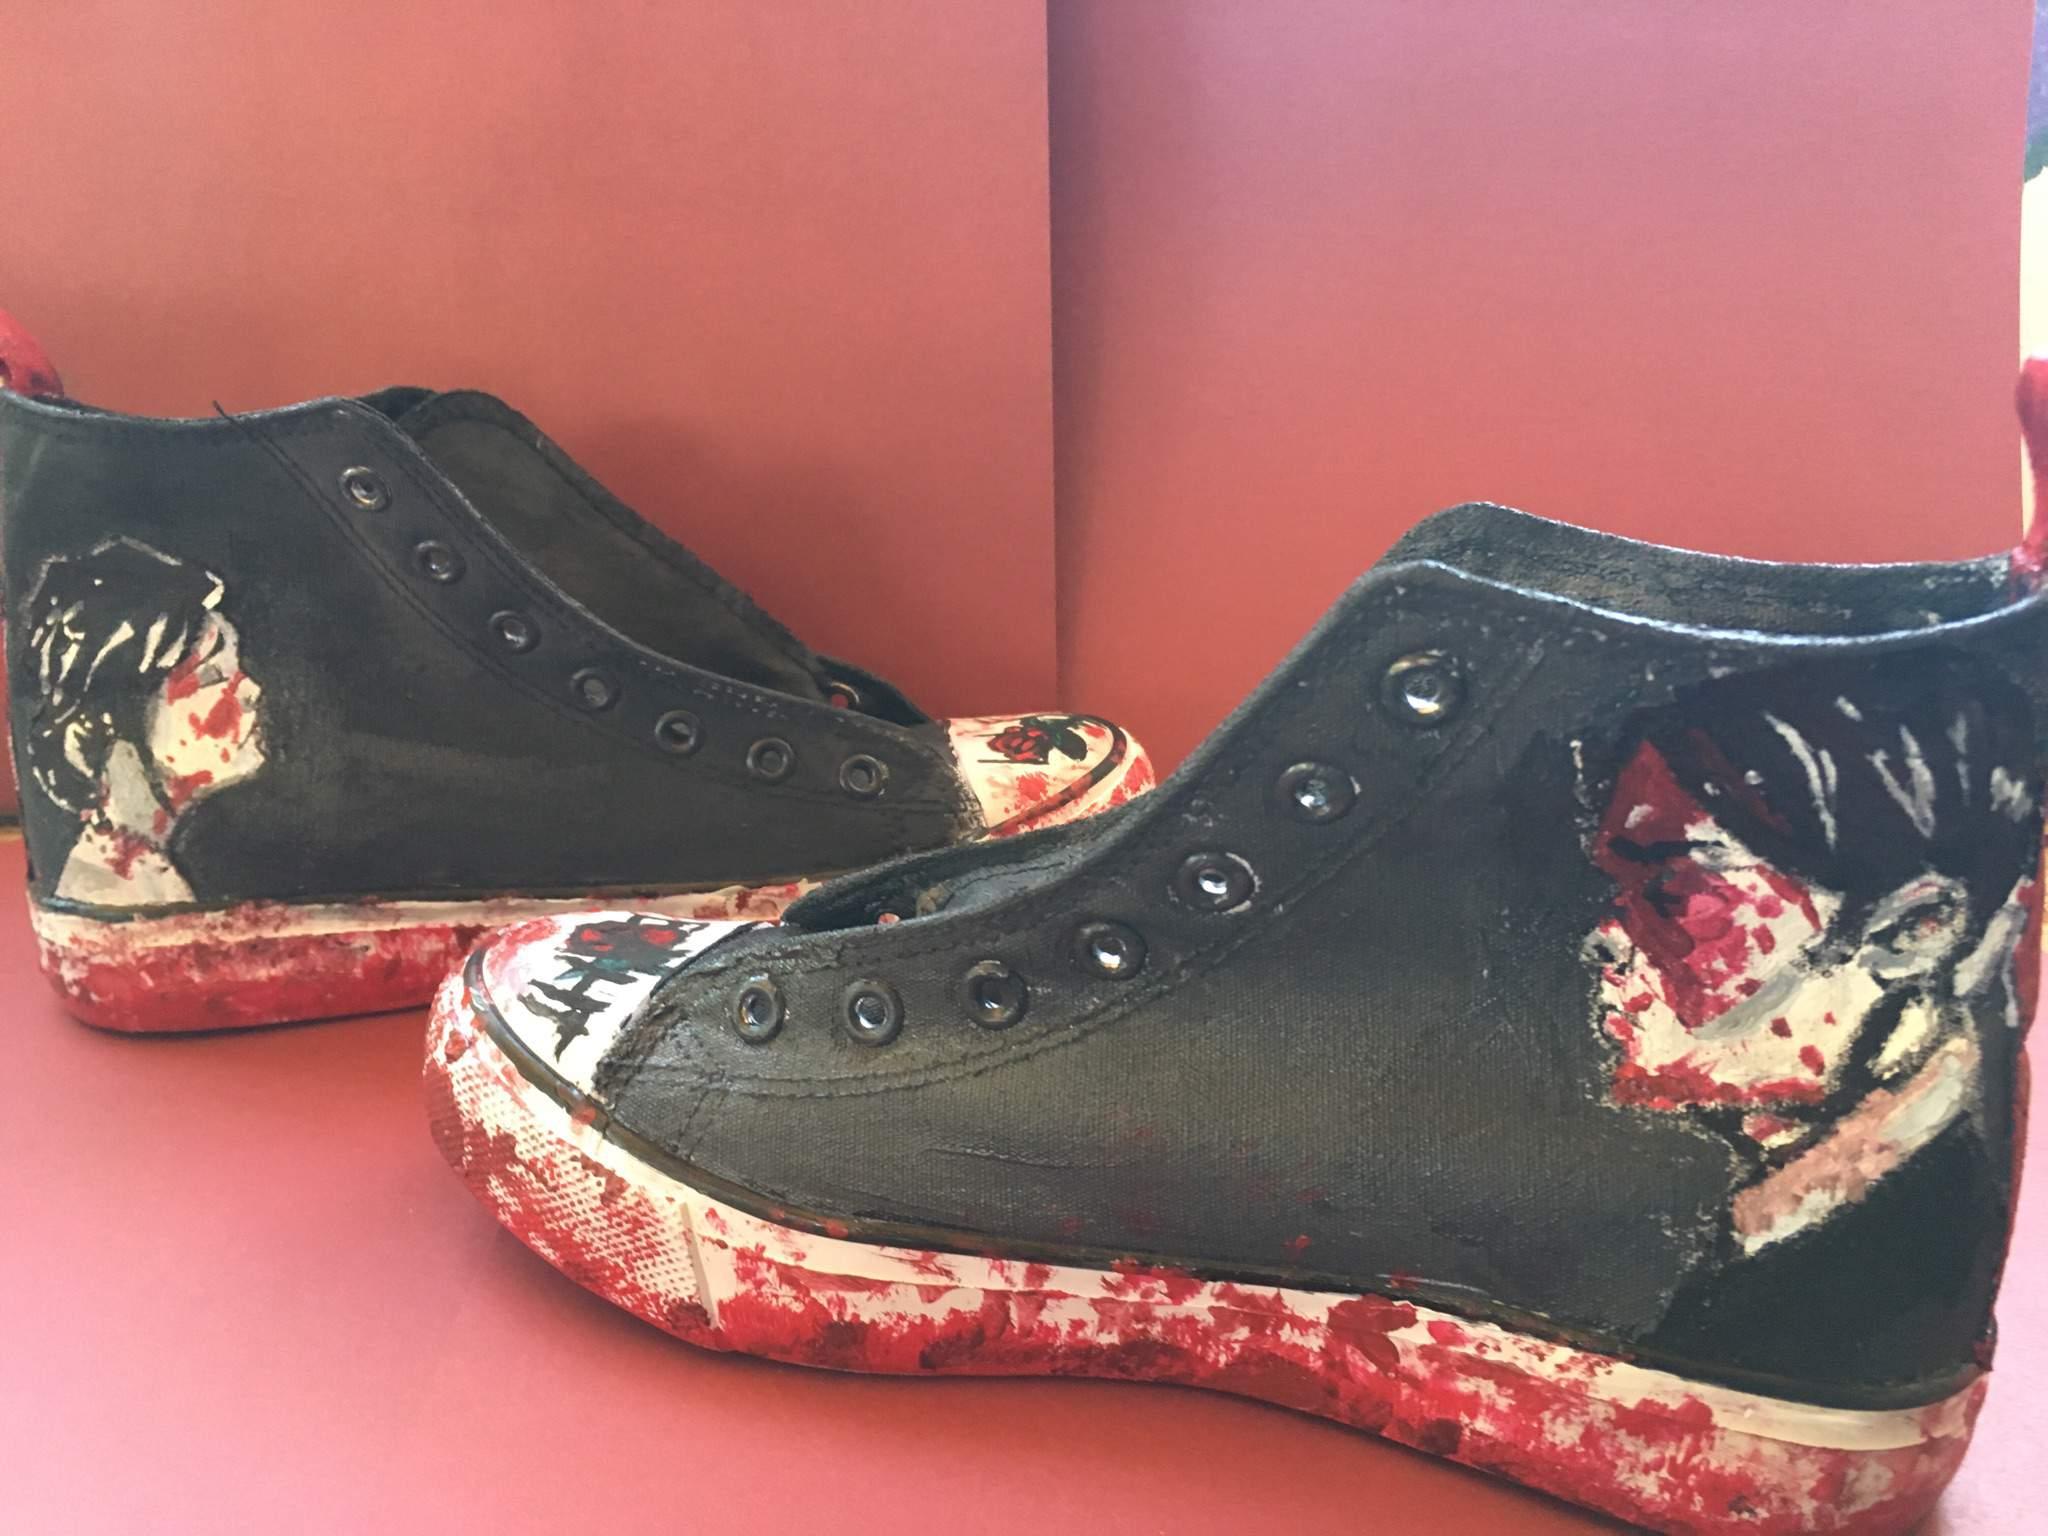 Happy 15th Three Cheers For Sweet Revenge Shoes Killjoys